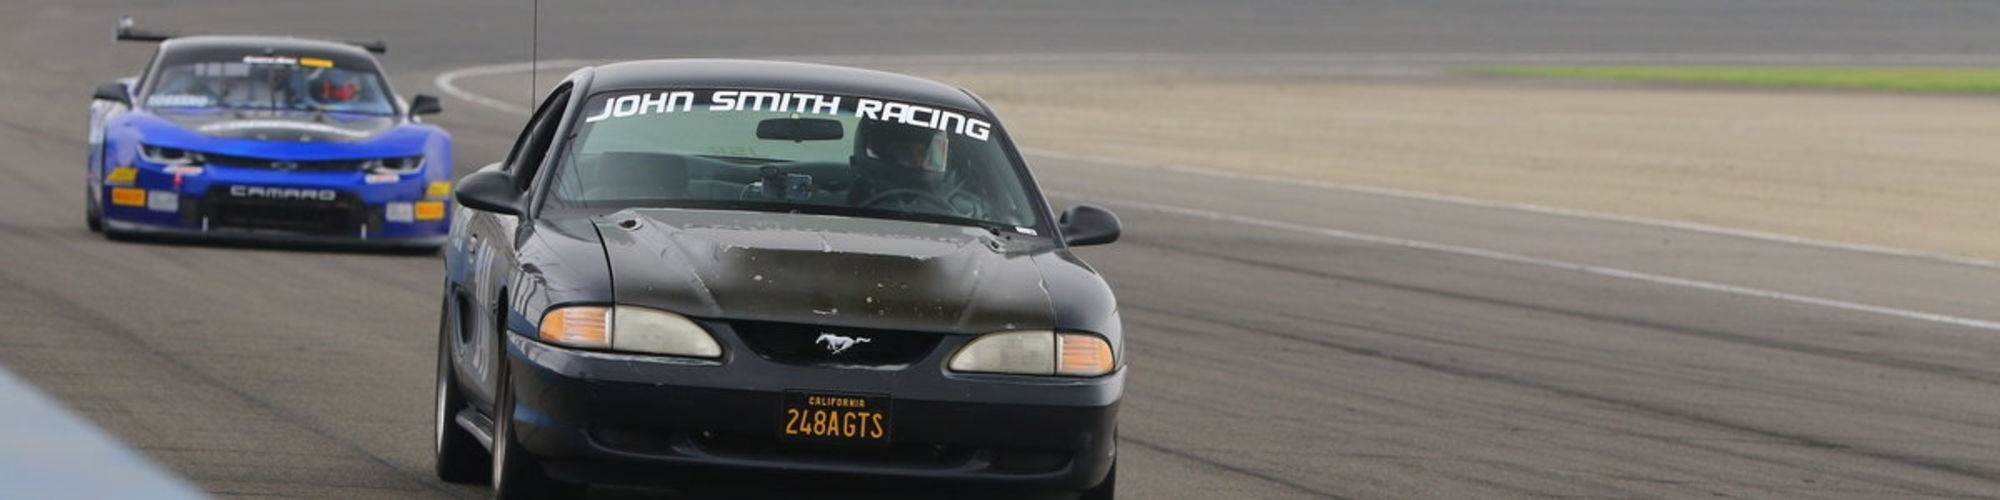 John Smith Racing cover image